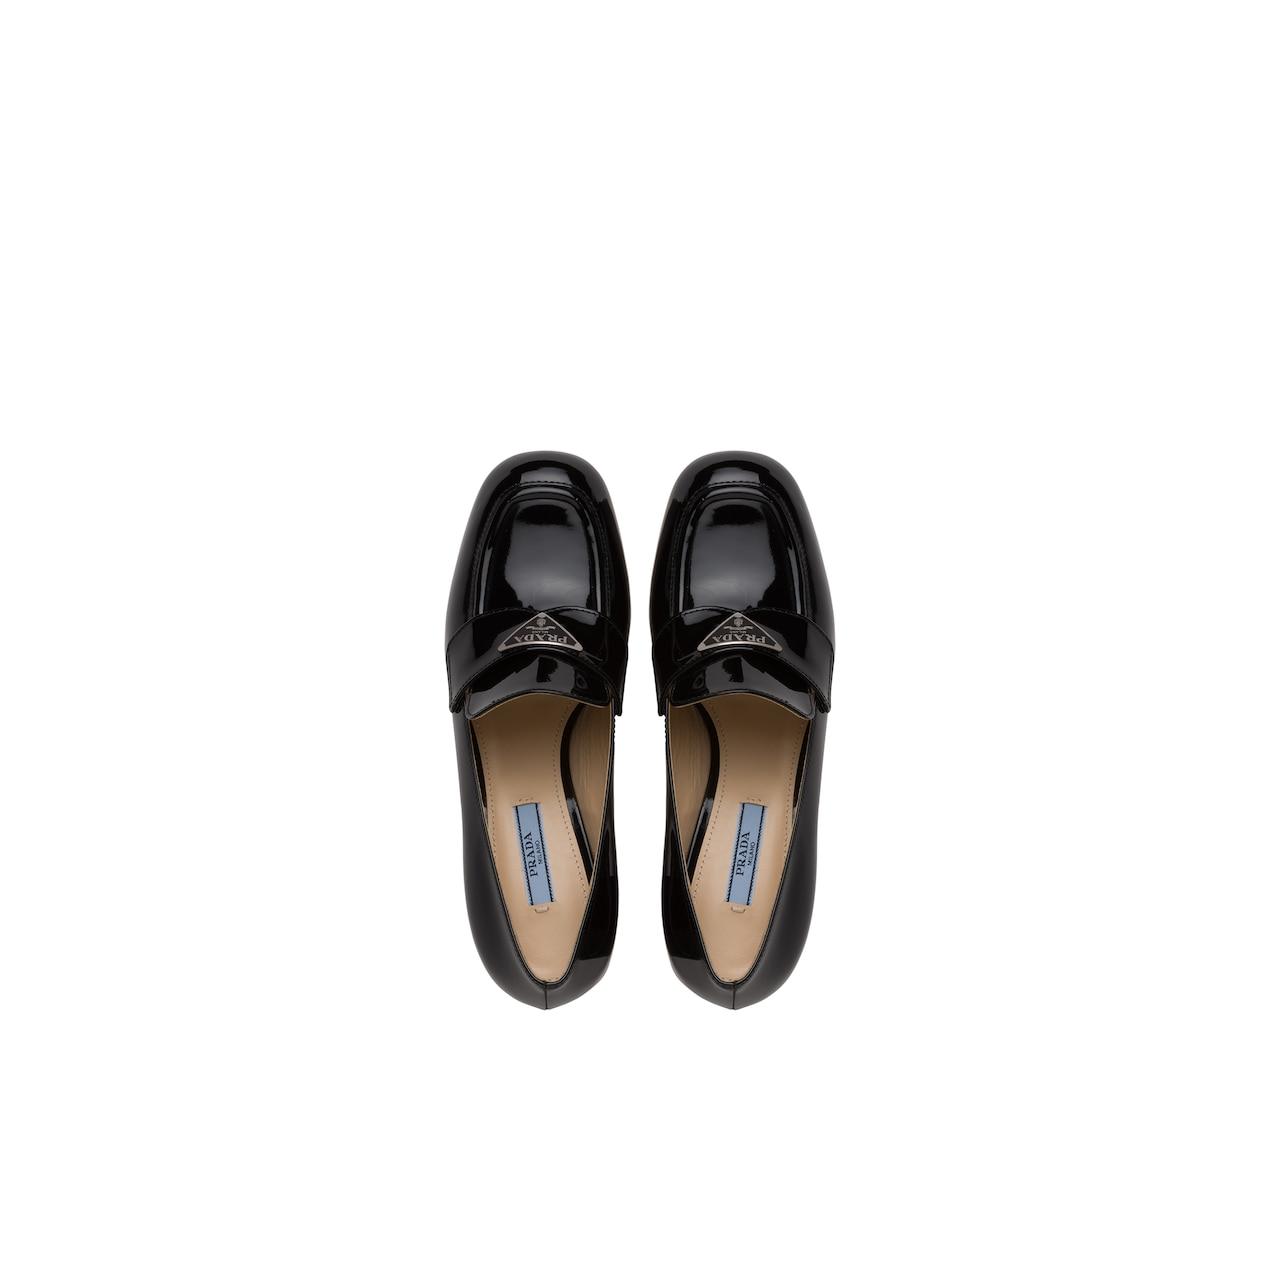 Prada Patent leather platform loafers 4